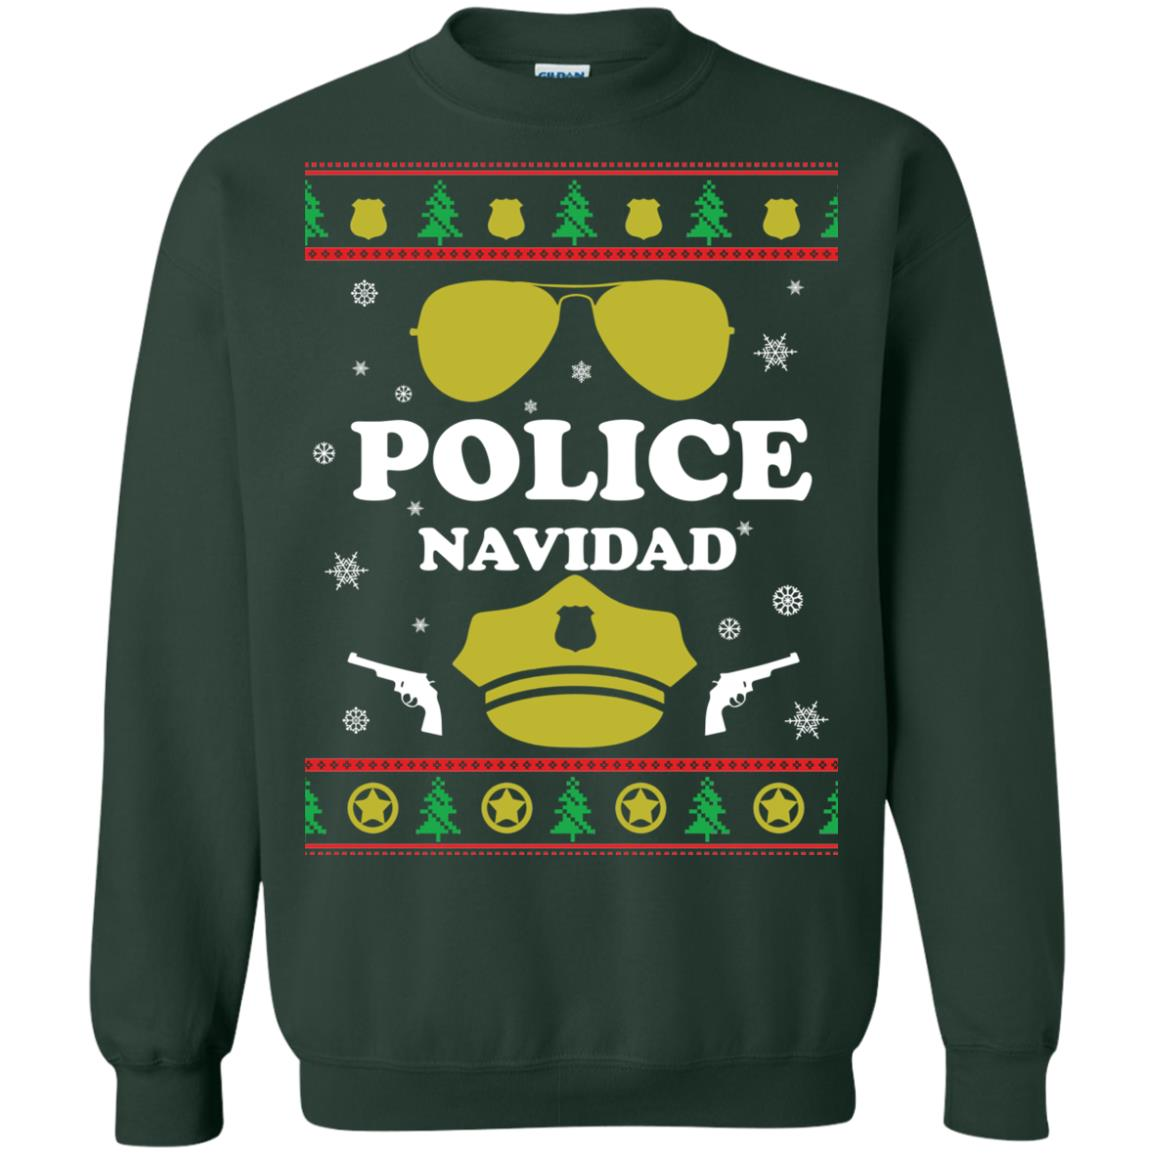 image 99px Police Navidad Christmas Sweater, Long Sleeve